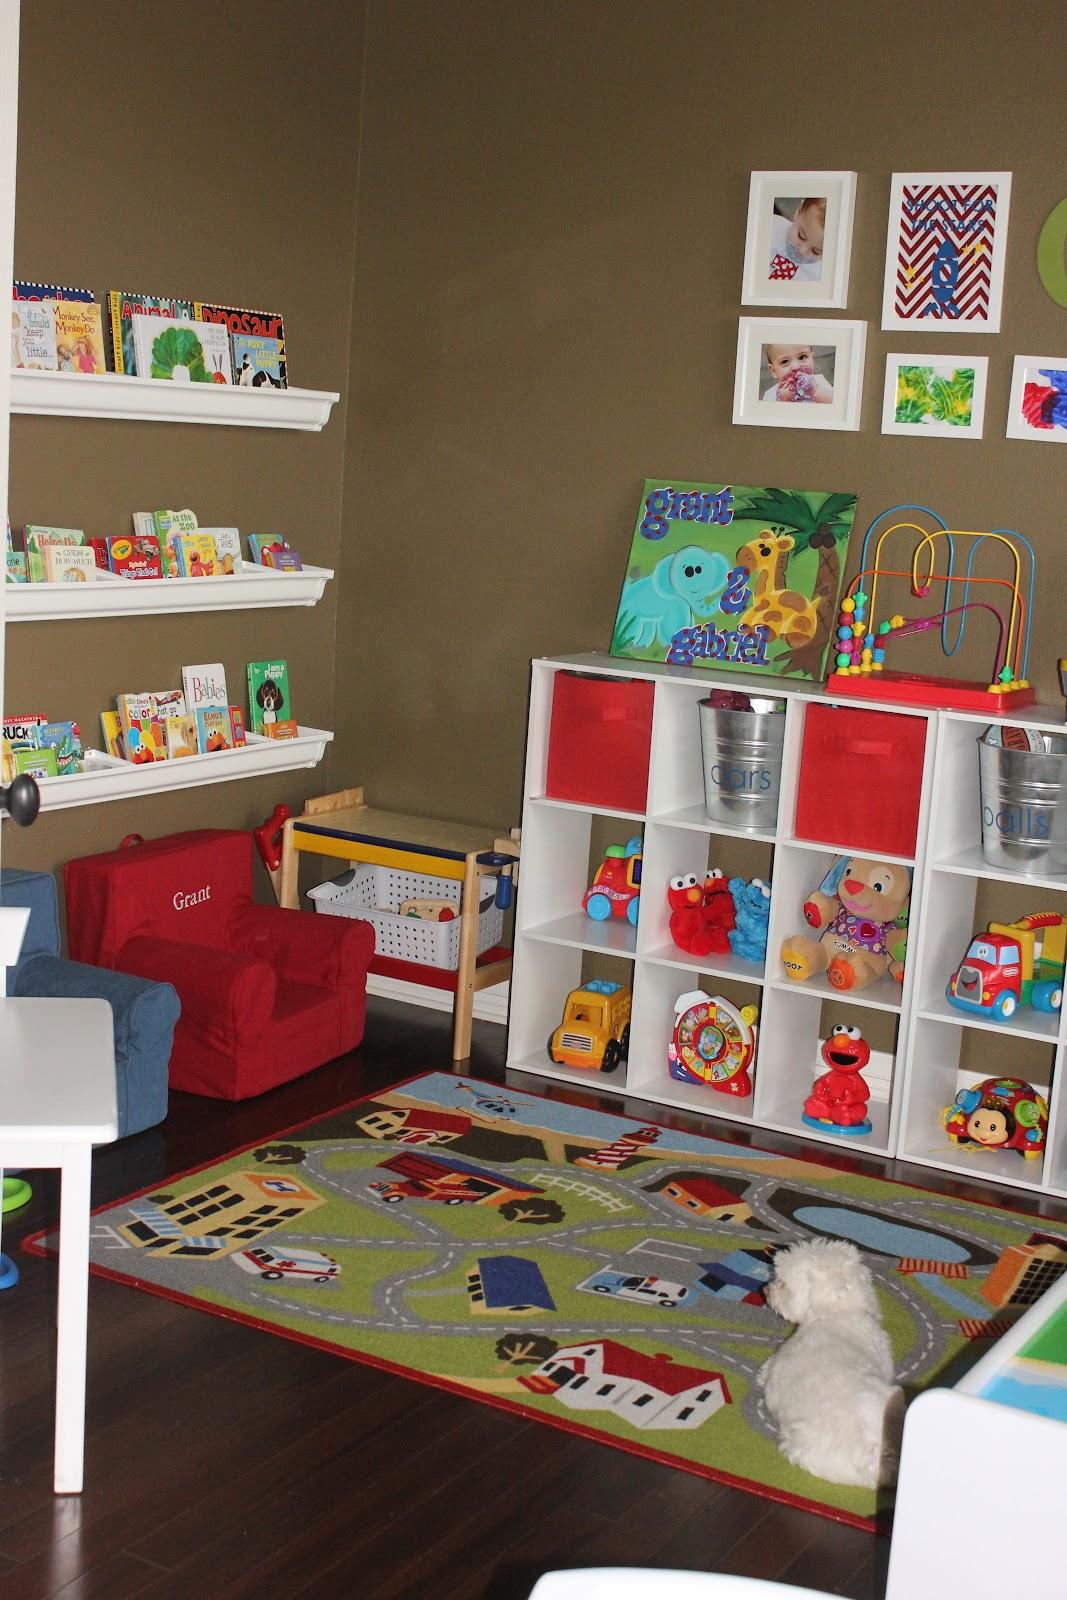 Kids Week: An Organized Playroom